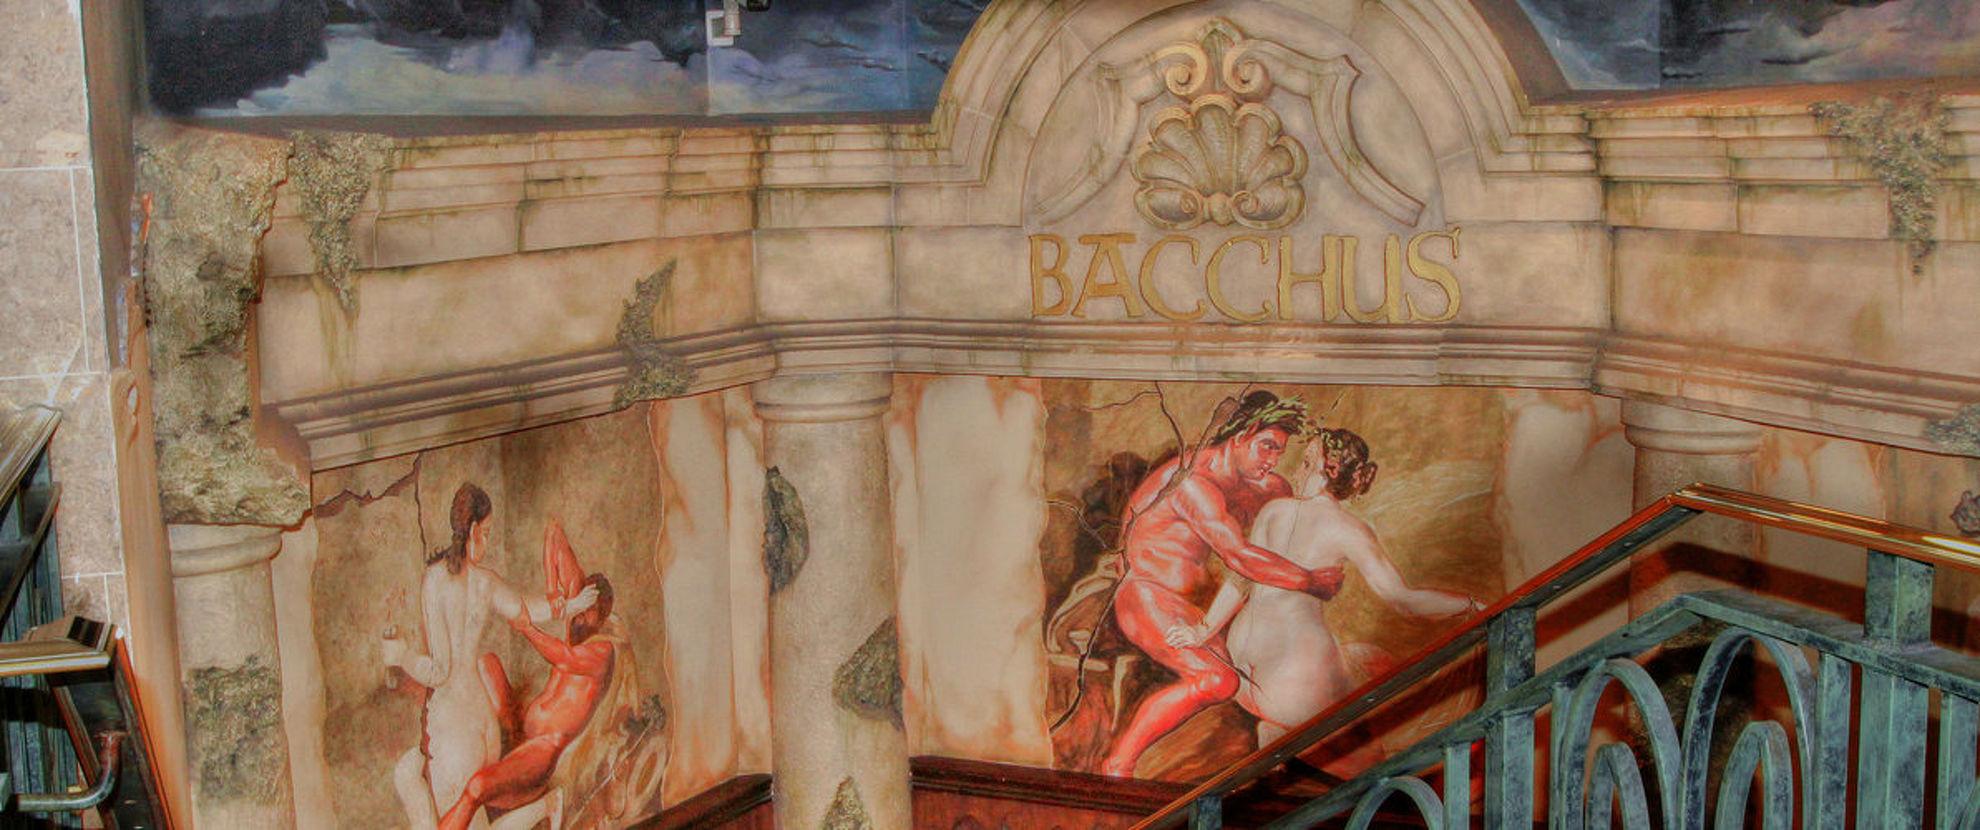 Explore Bacchus